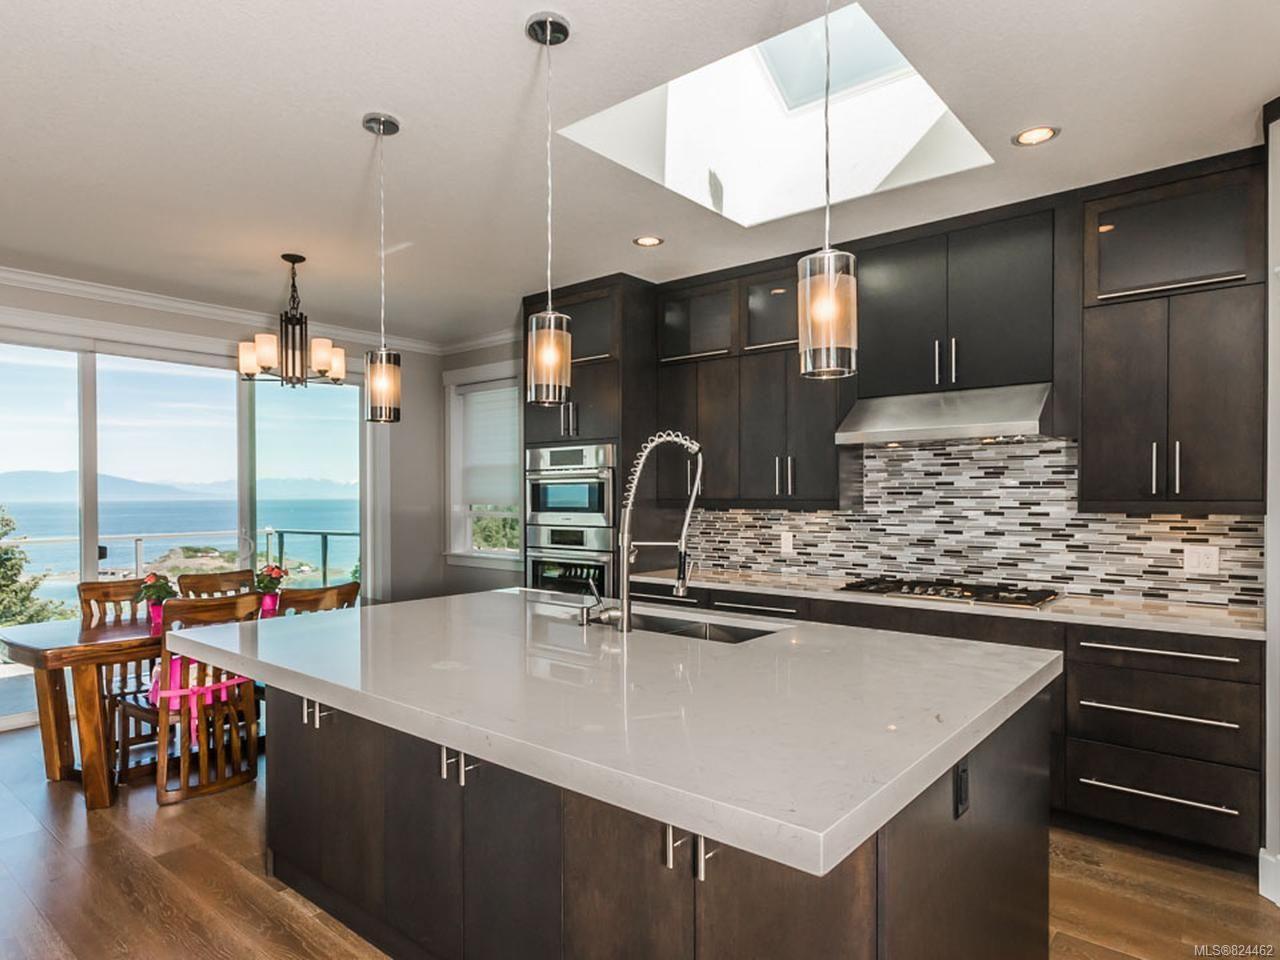 Photo 5: Photos: 3864 Gulfview Dr in NANAIMO: Na North Nanaimo House for sale (Nanaimo)  : MLS®# 824462